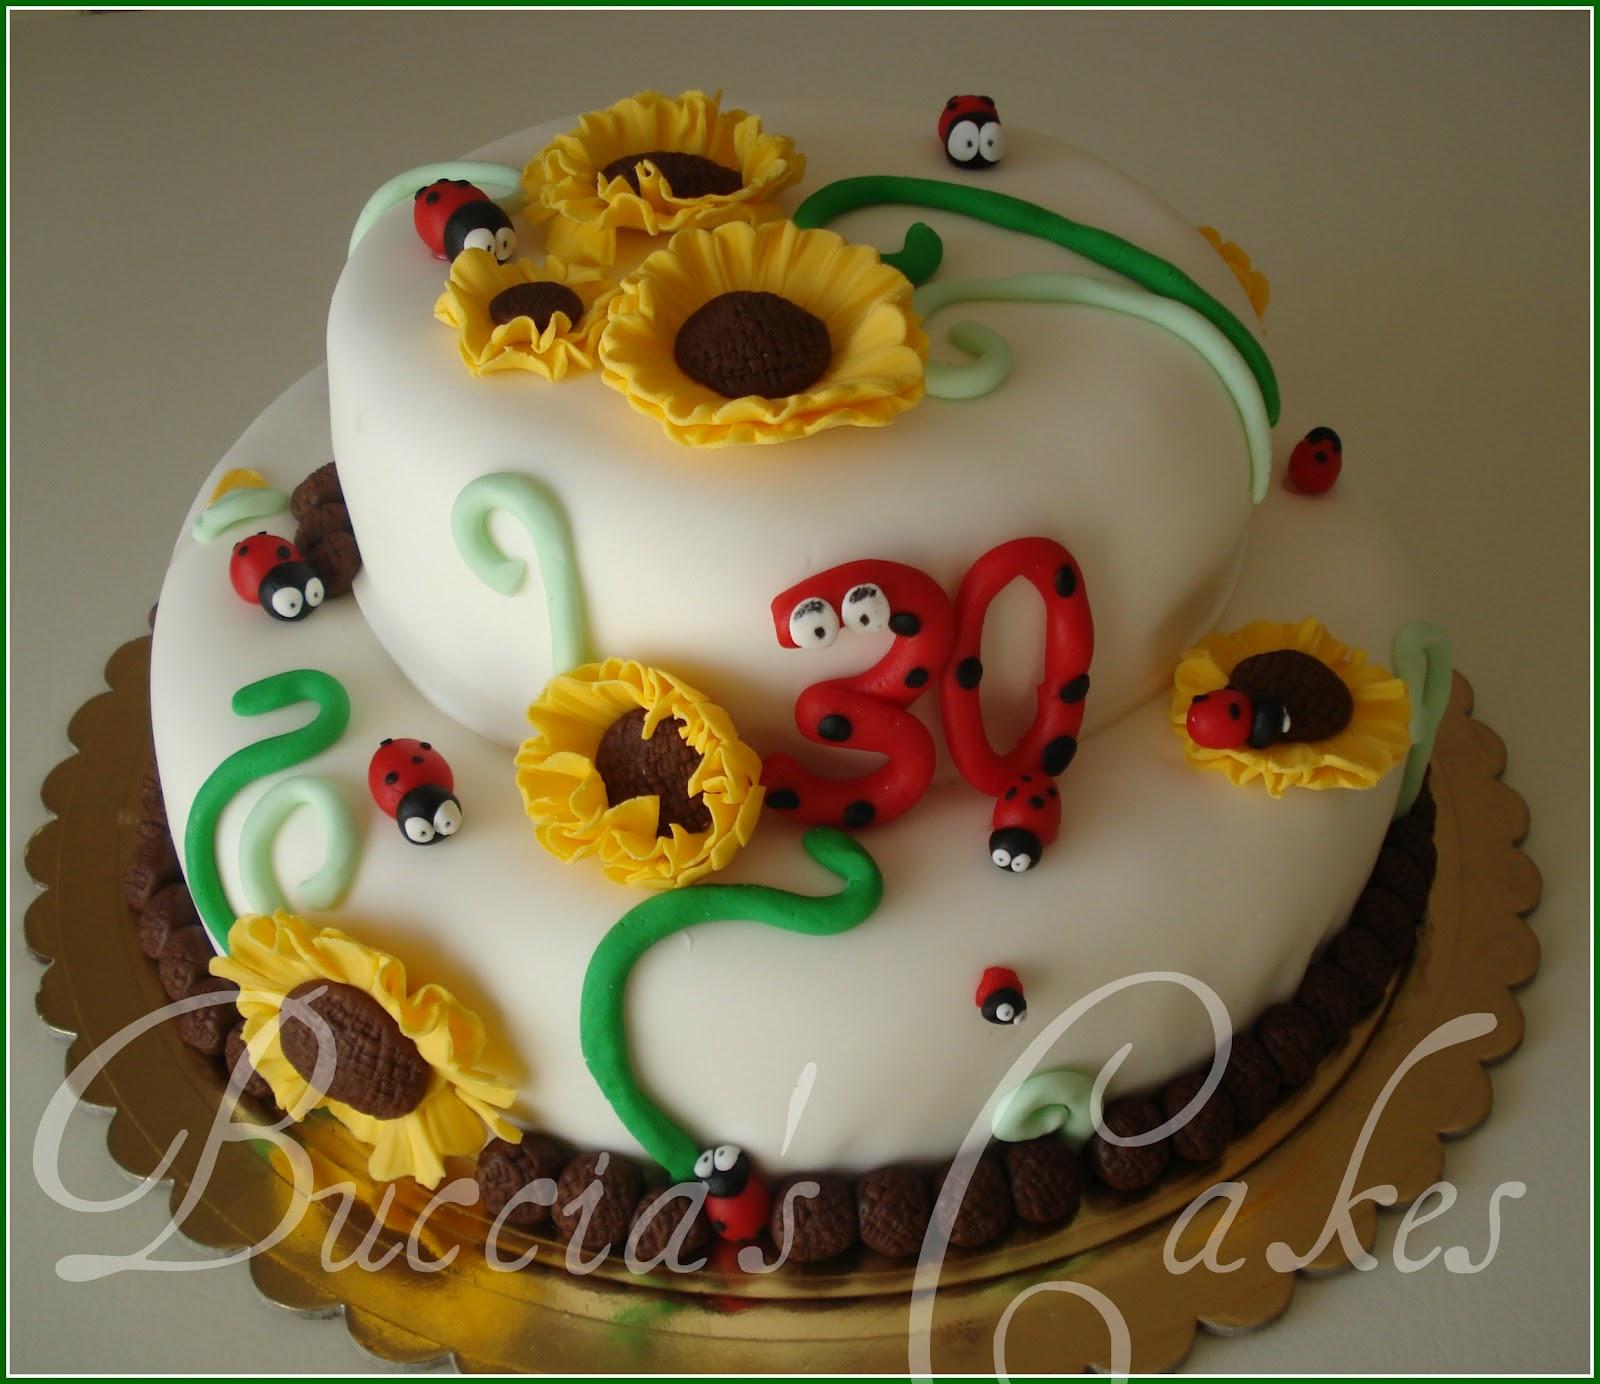 Torte Matrimonio Girasoli : Buccia s cakes torta girasoli